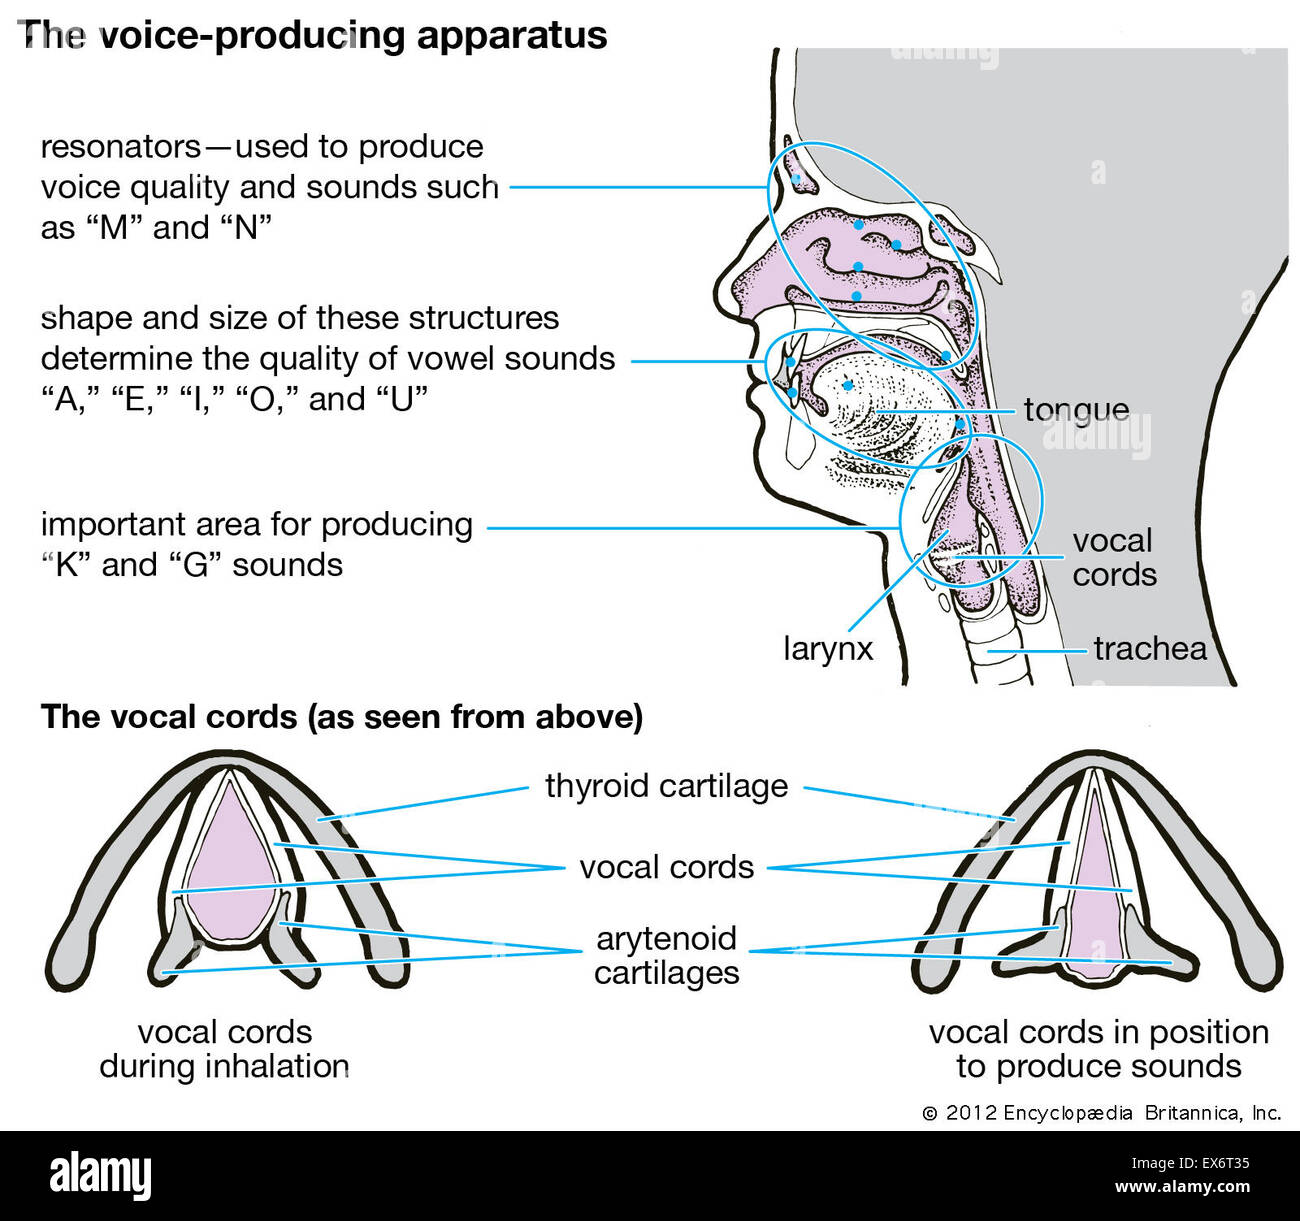 Human Vocal Cords Stock Photos & Human Vocal Cords Stock Images - Alamy